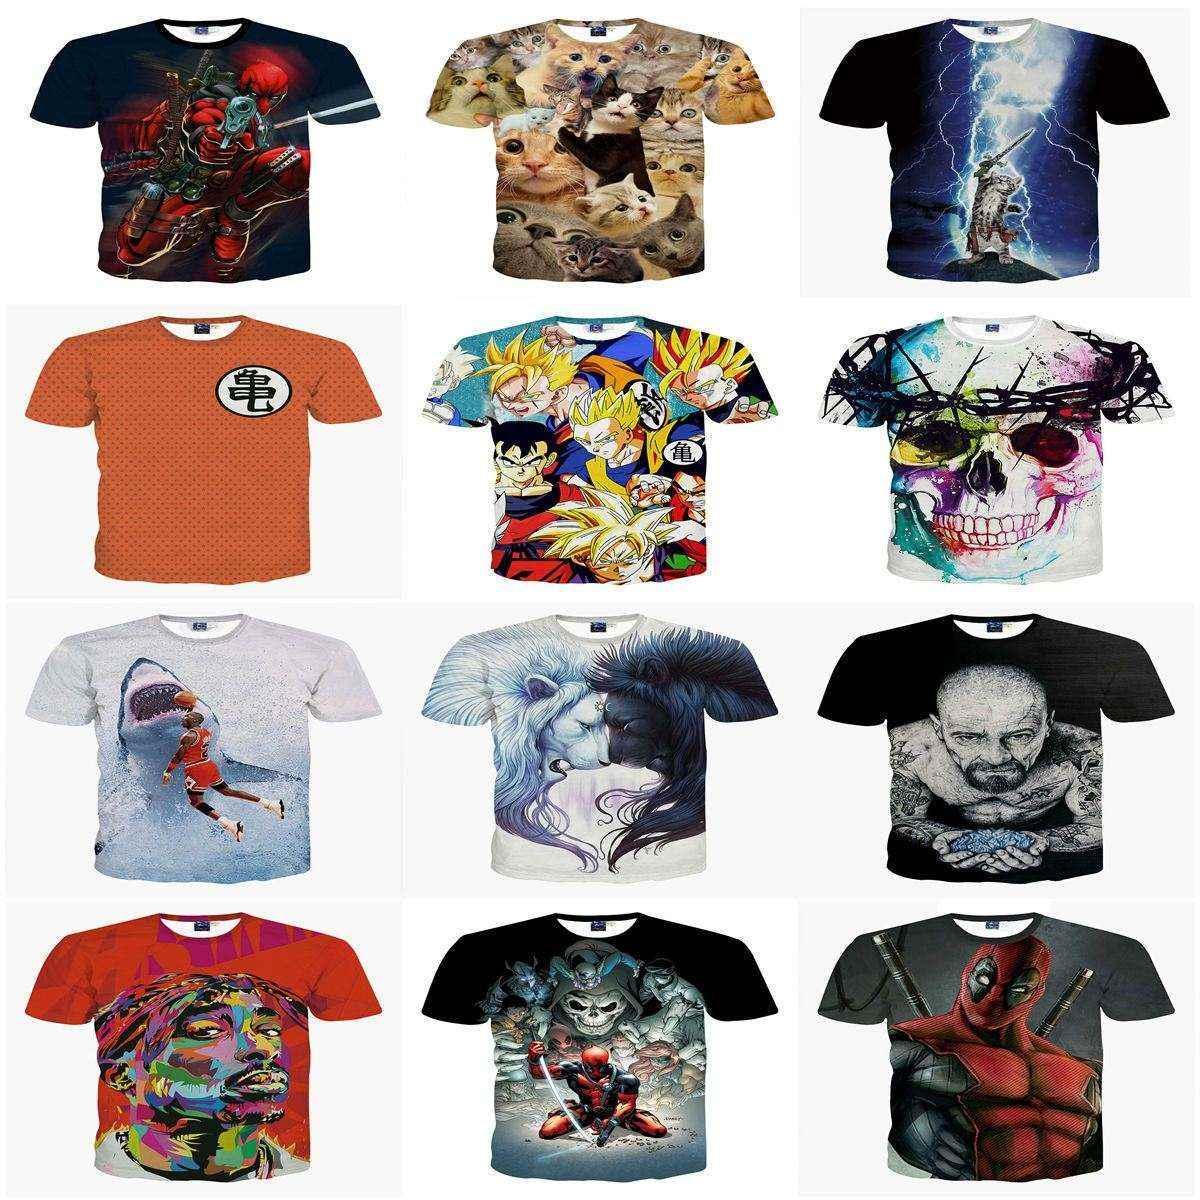 Design t shirt europe - See Larger Image